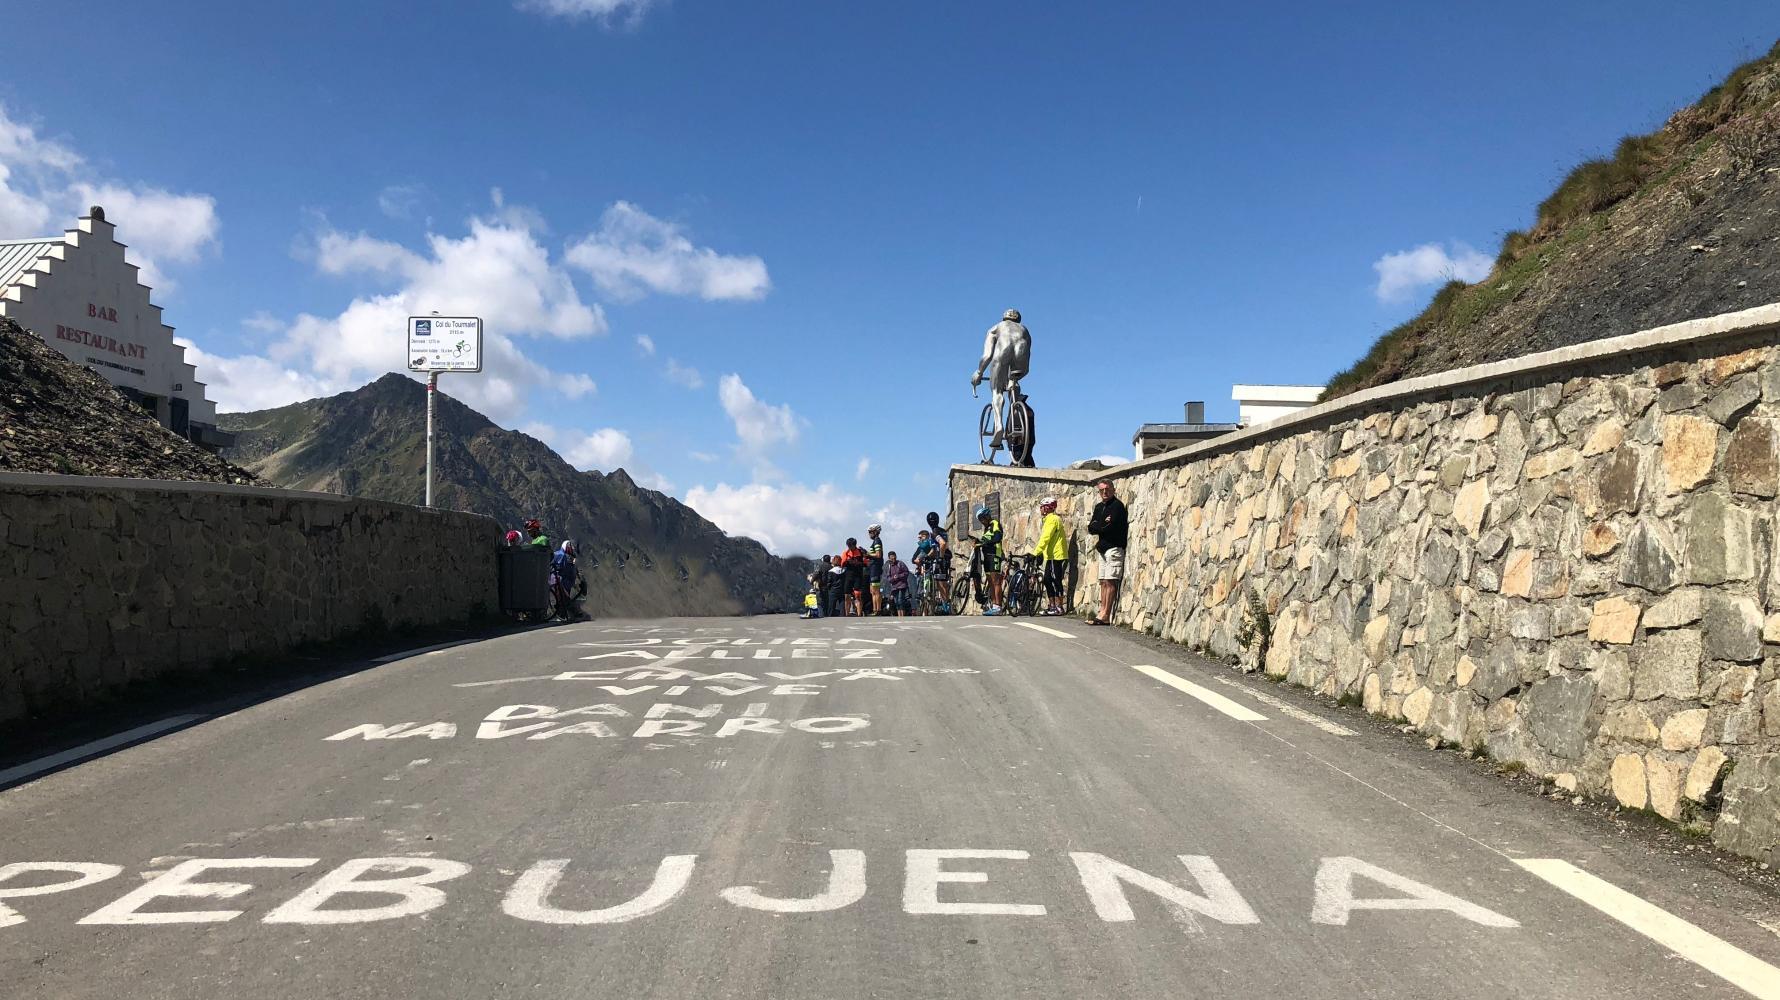 Col du Tourmalet - Luz-Saint-Sauveur Bike Climb - PJAMM Cycling